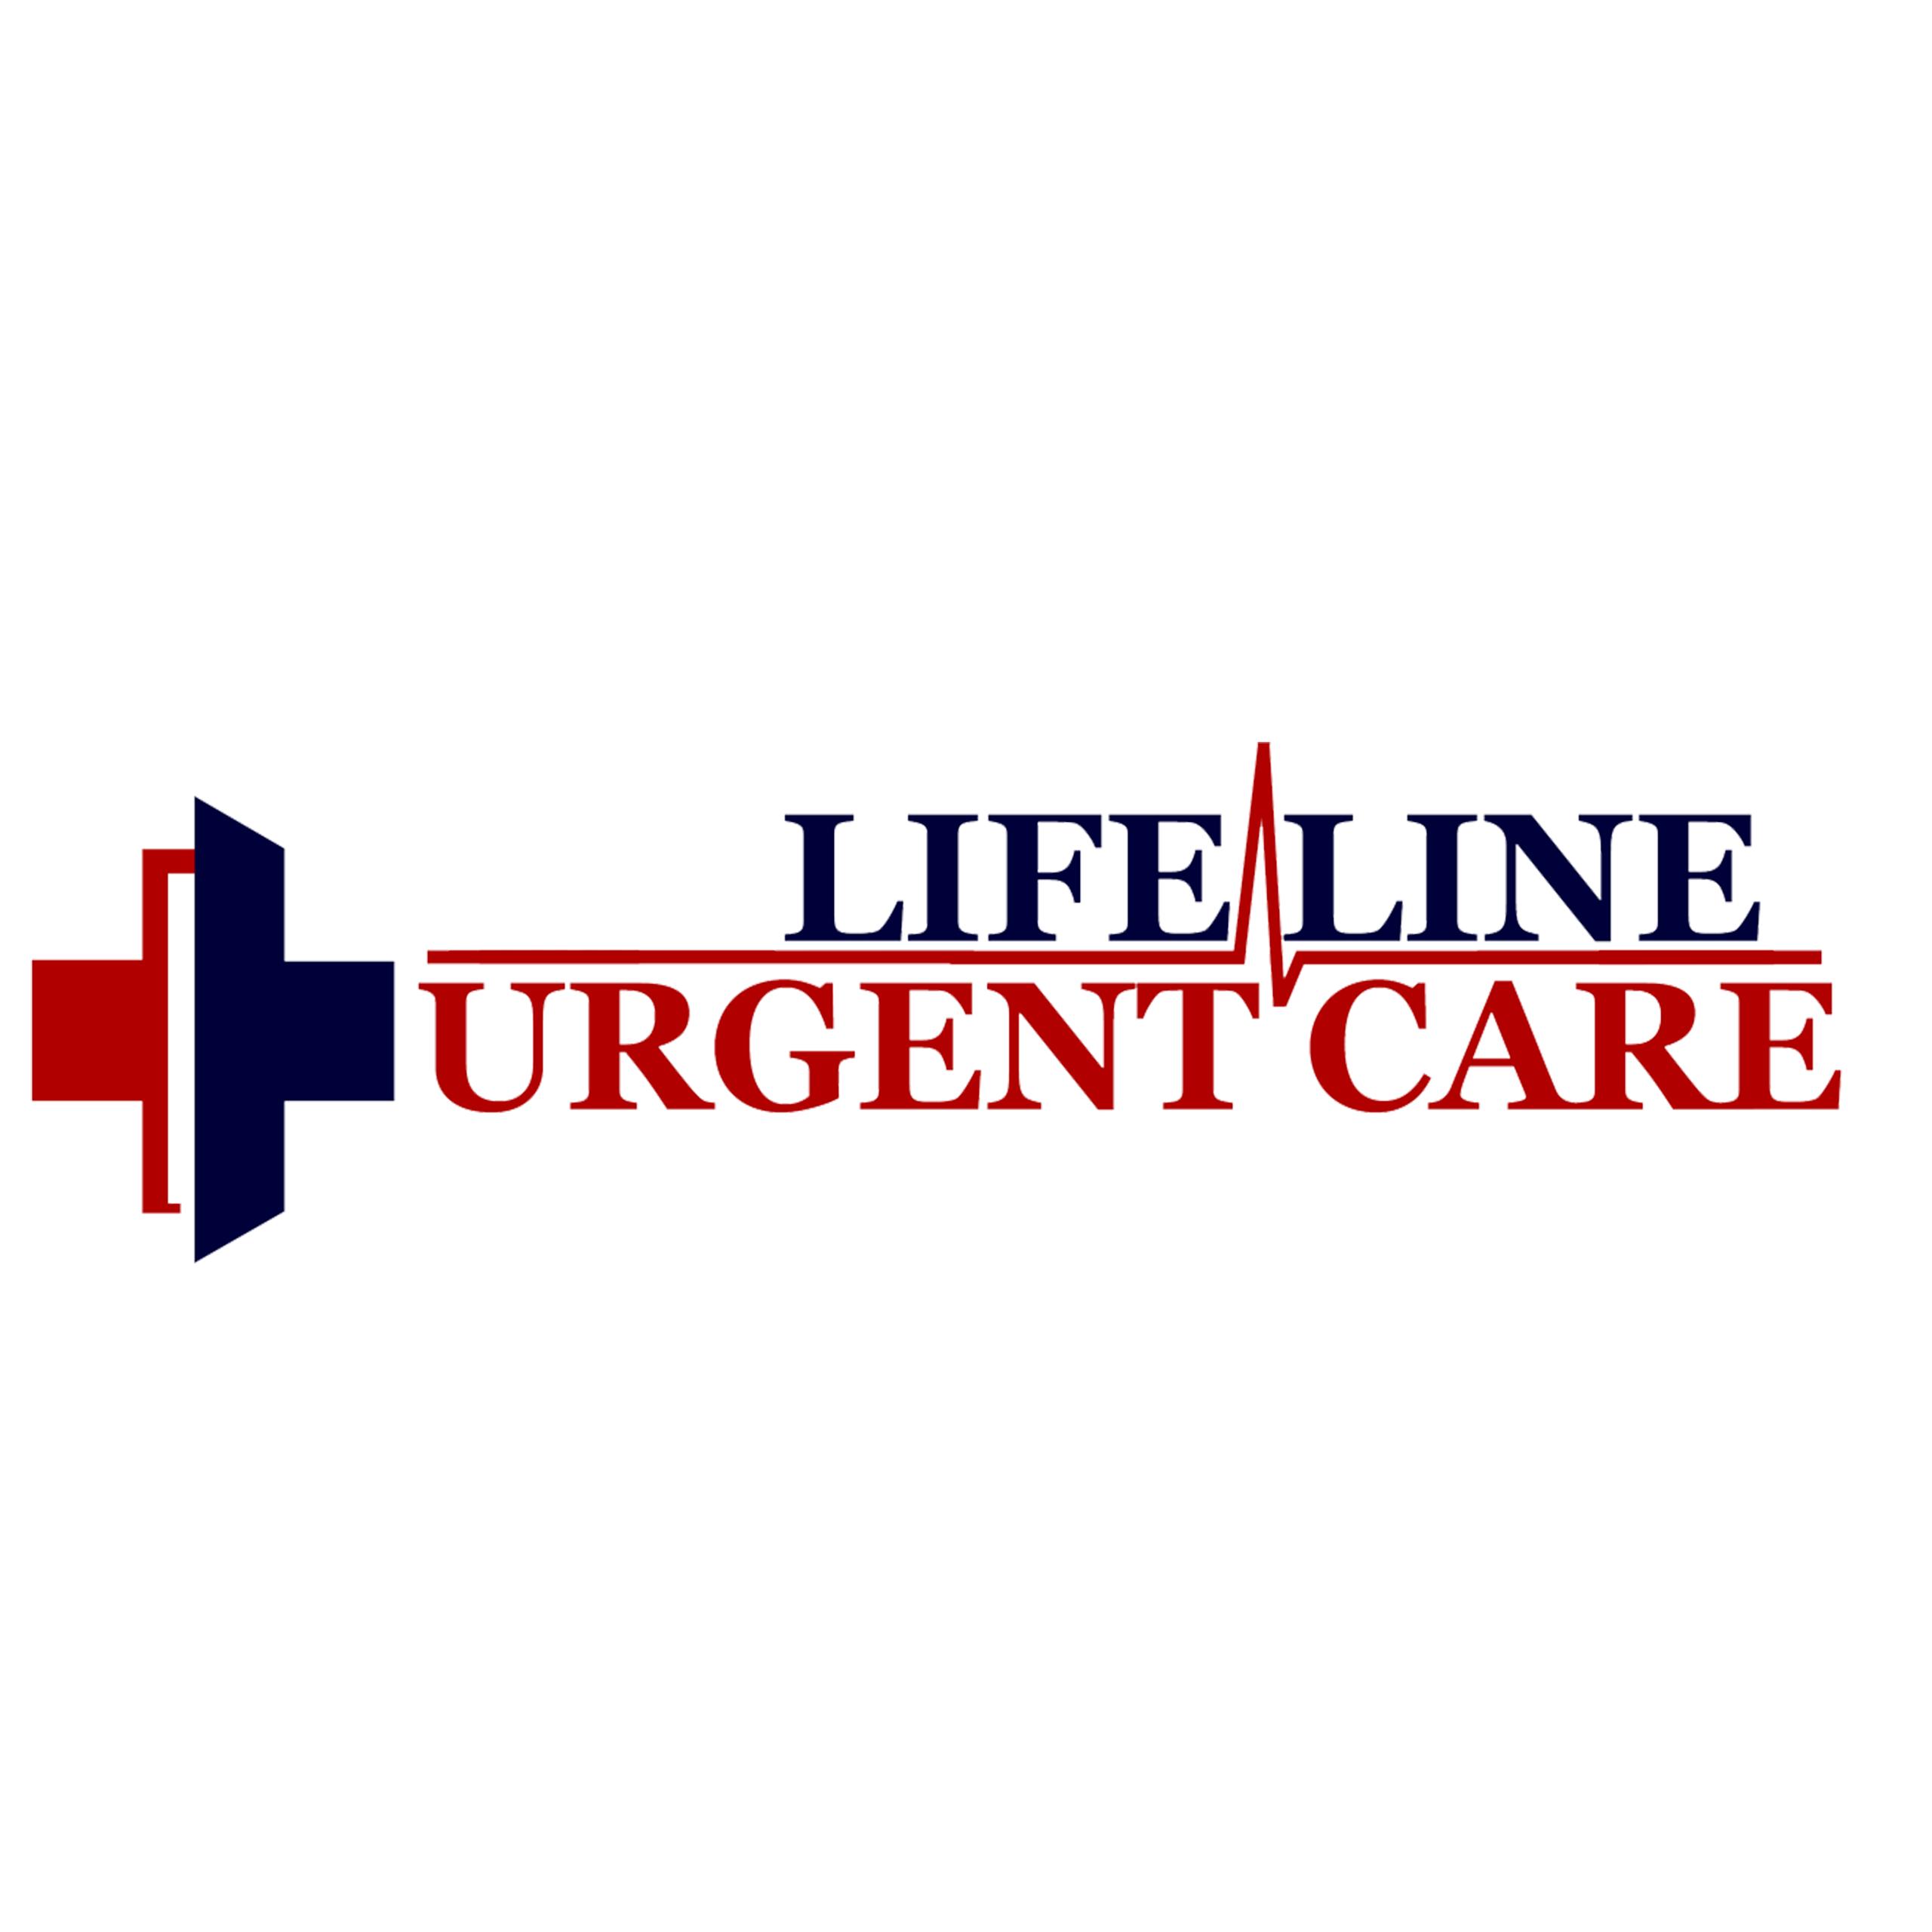 Lifeline Urgent care - Humble, TX 77338 - (281)318-7442   ShowMeLocal.com